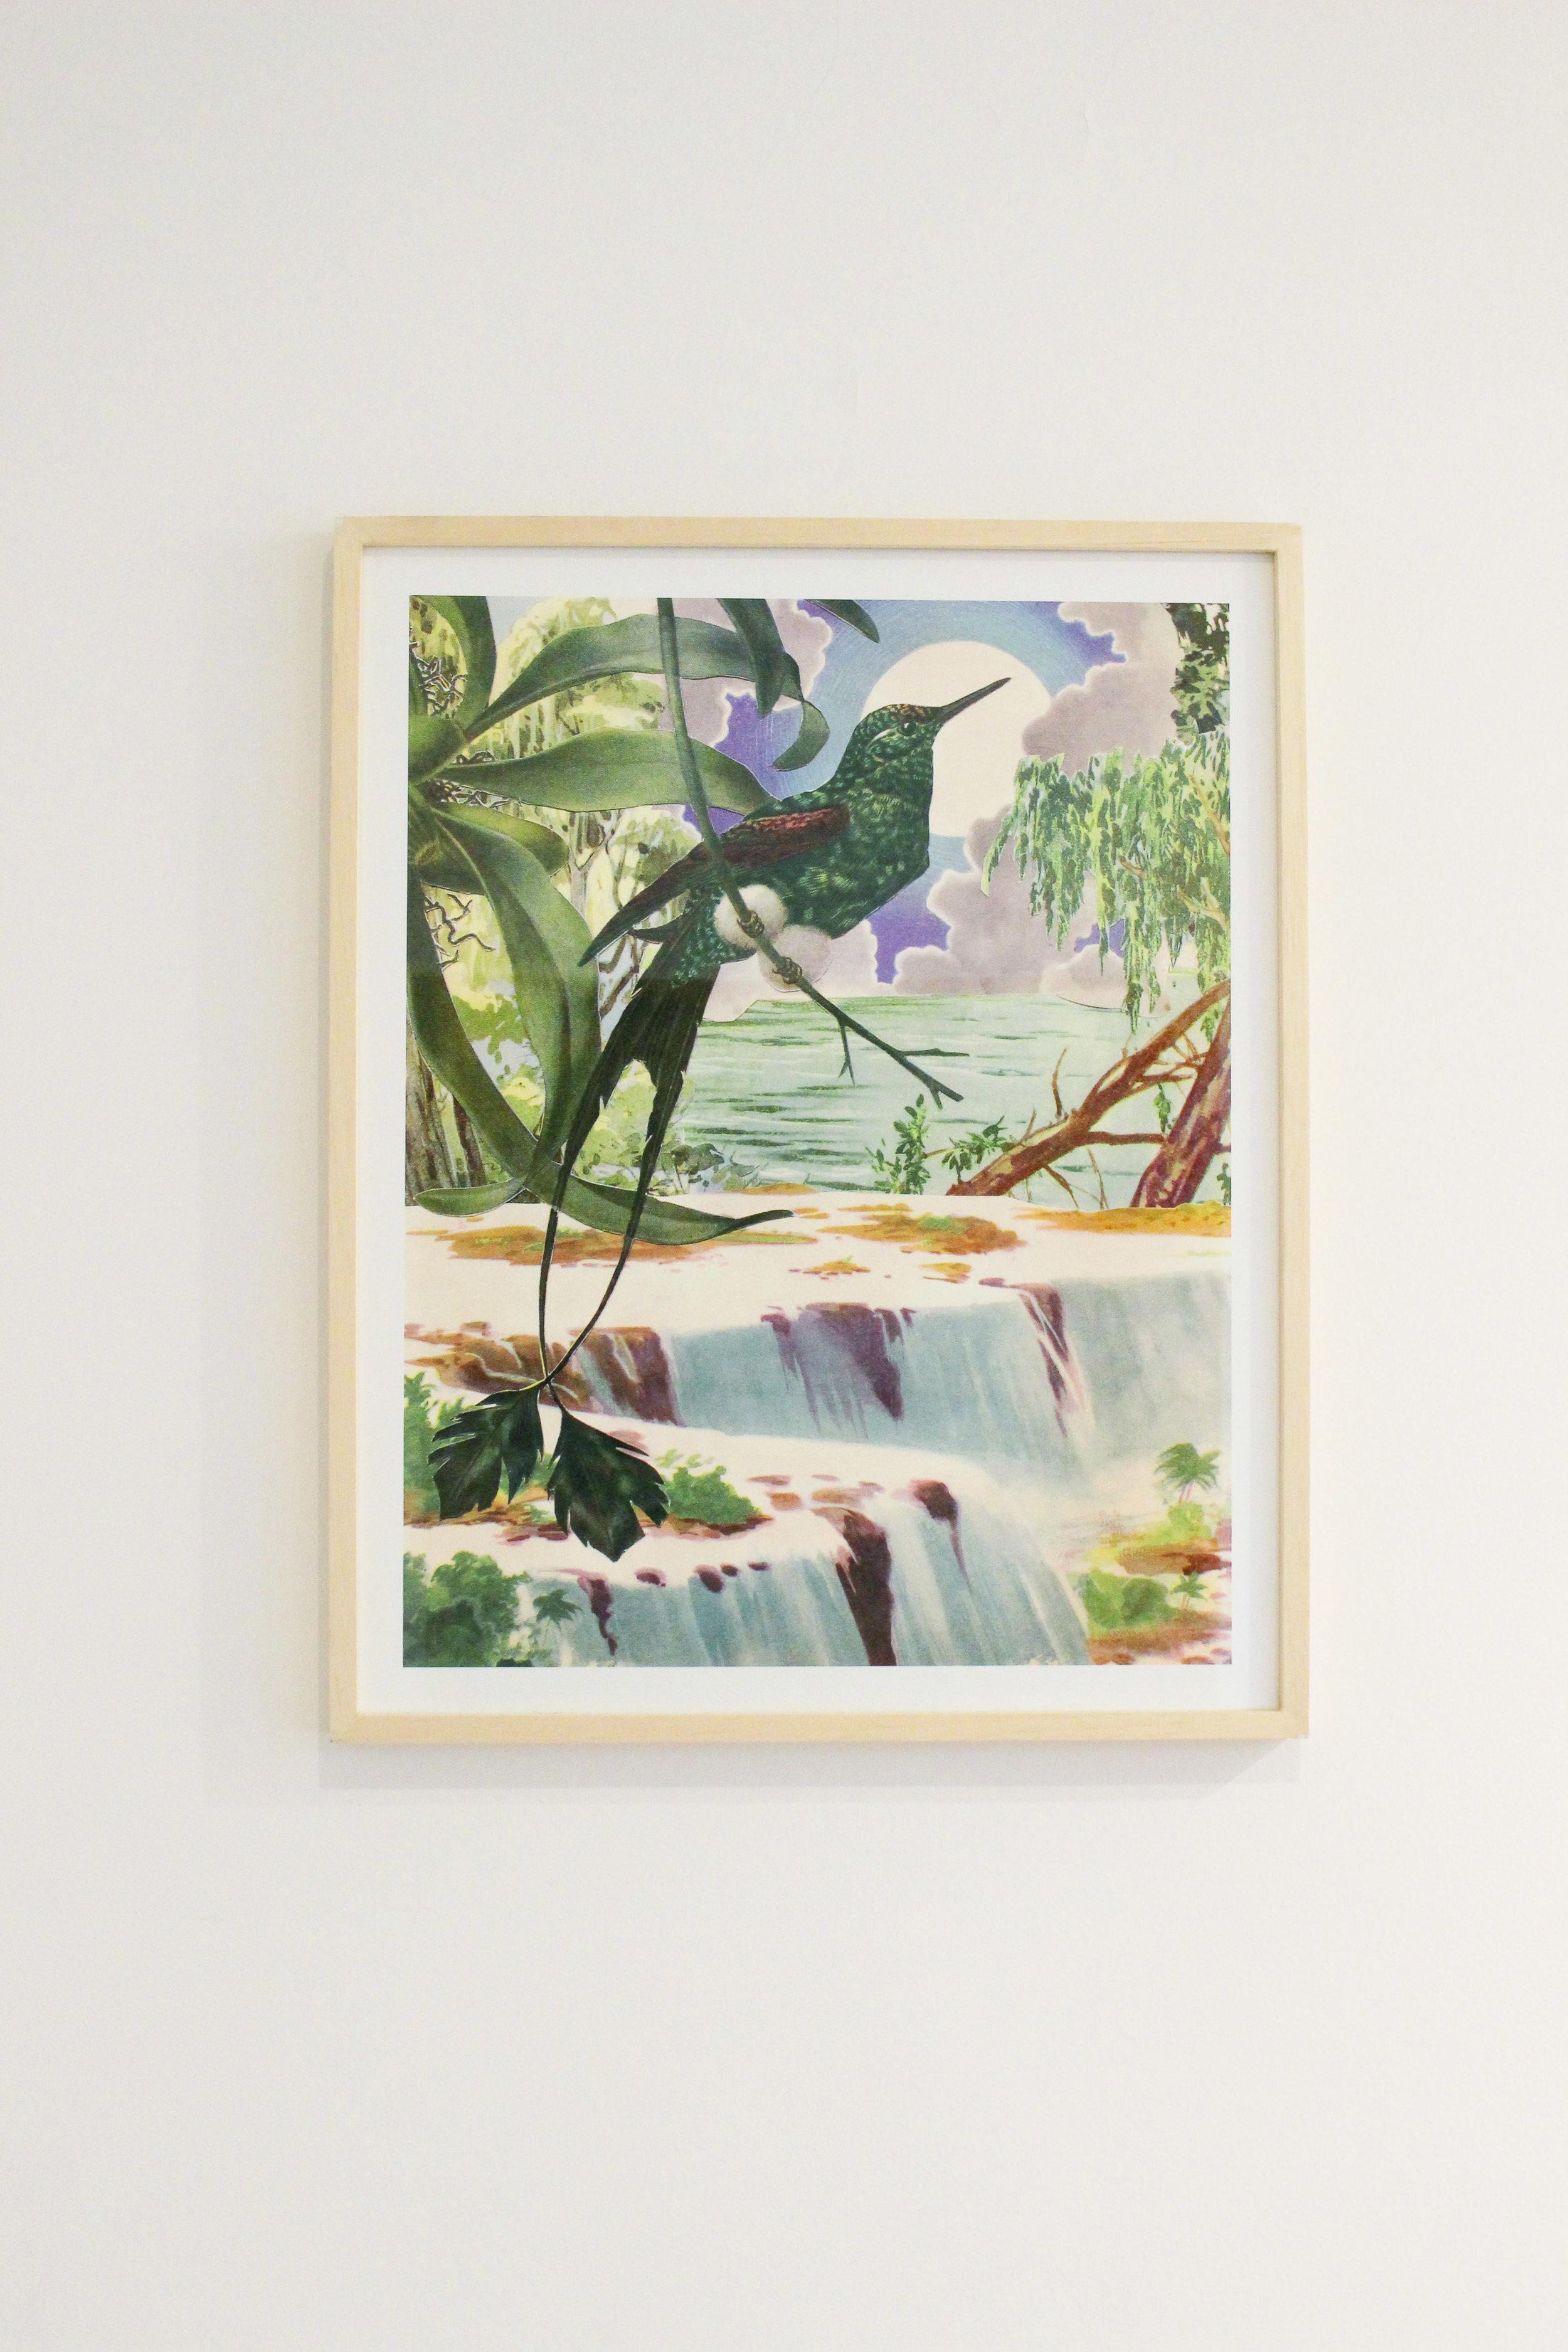 El rio    framed fine art print, limited edition  Canson® Infinity Edition Etching Rag 310 g/m²  65 X 50 CM    6000 ars